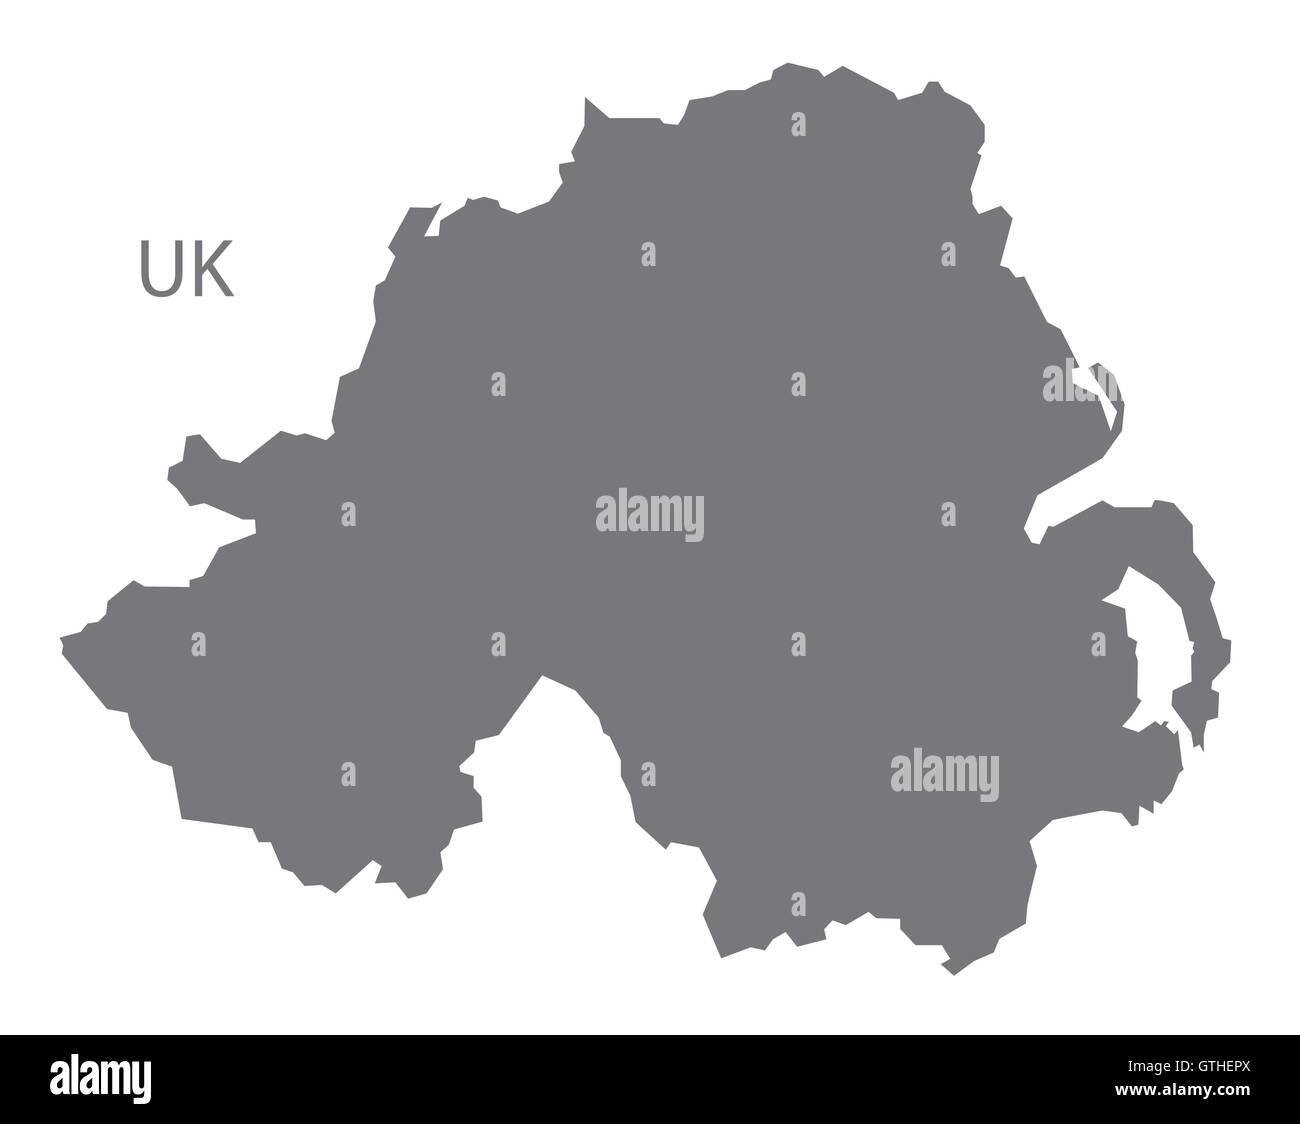 Northern Ireland map grey - Stock Image